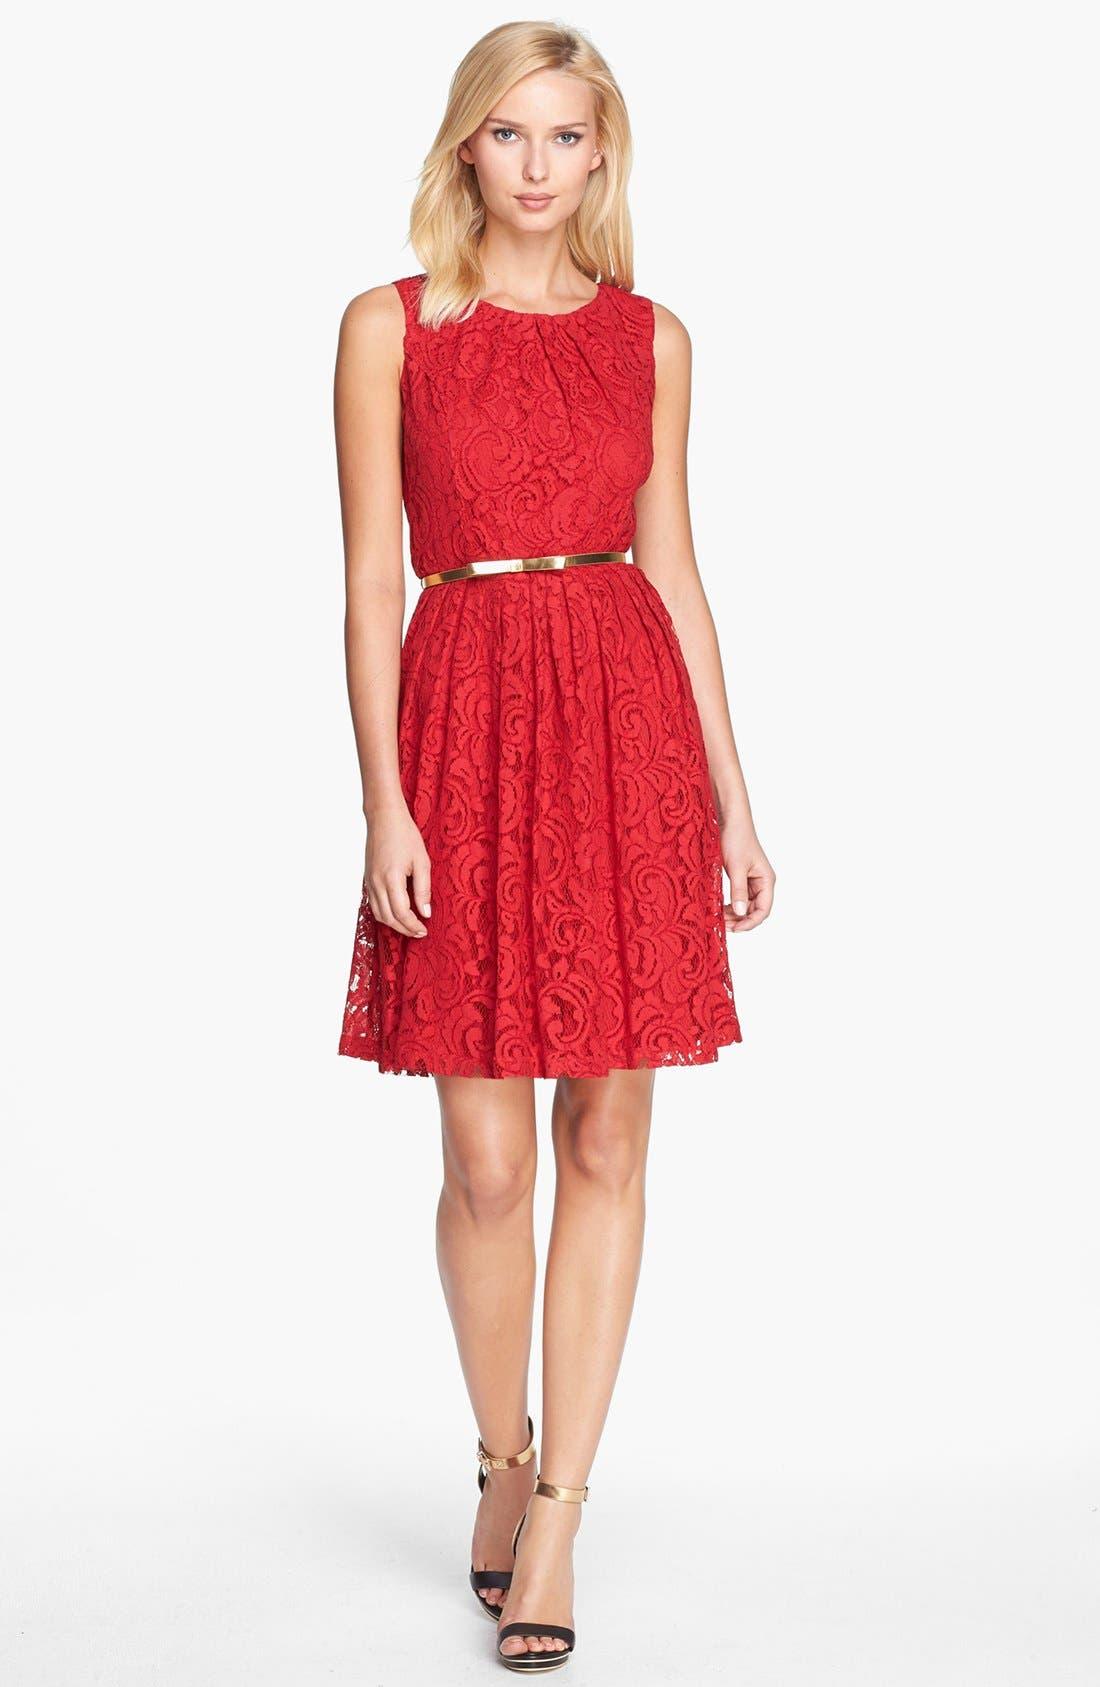 Alternate Image 1 Selected - Ellen Tracy Lace Fit & Flare Dress (Regular & Petite)